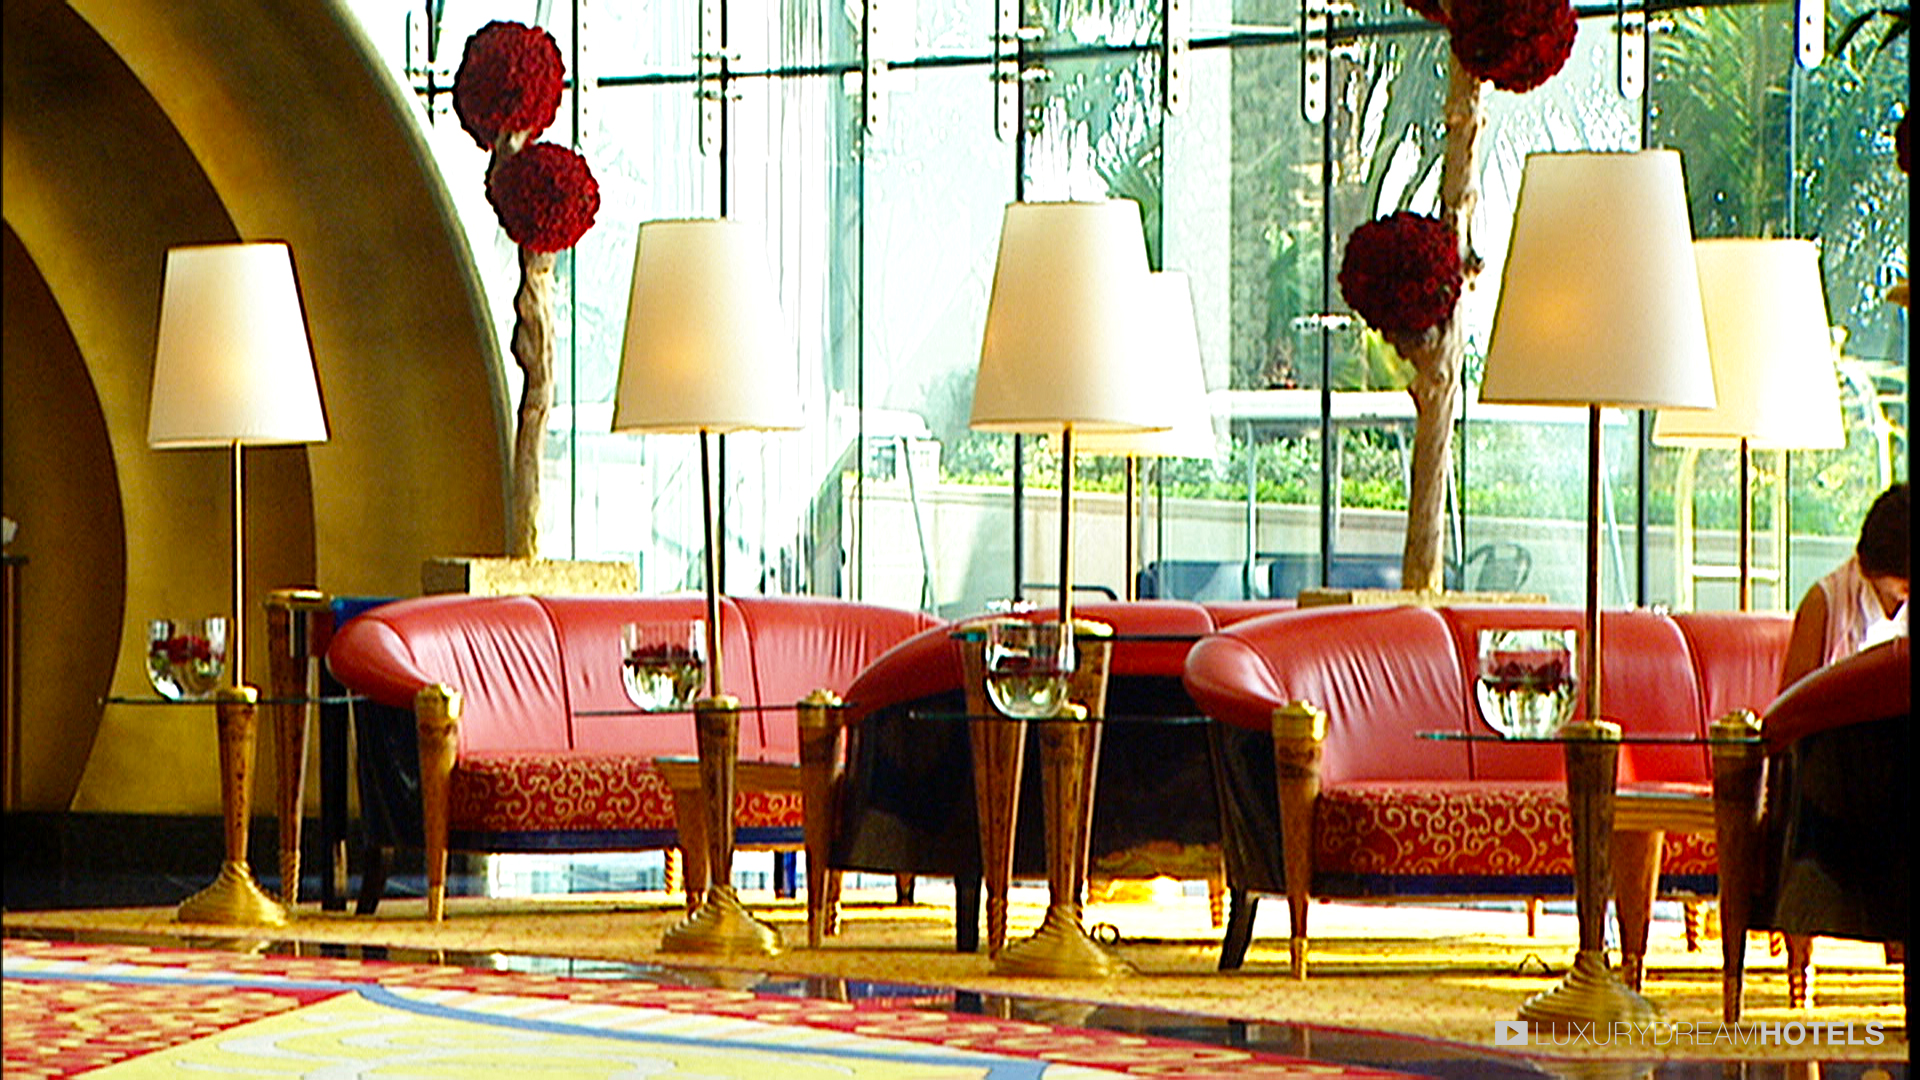 Luxury Hotel, Burj Al Arab, Dubai, United Arab Emirates   Luxury Dream  Hotels